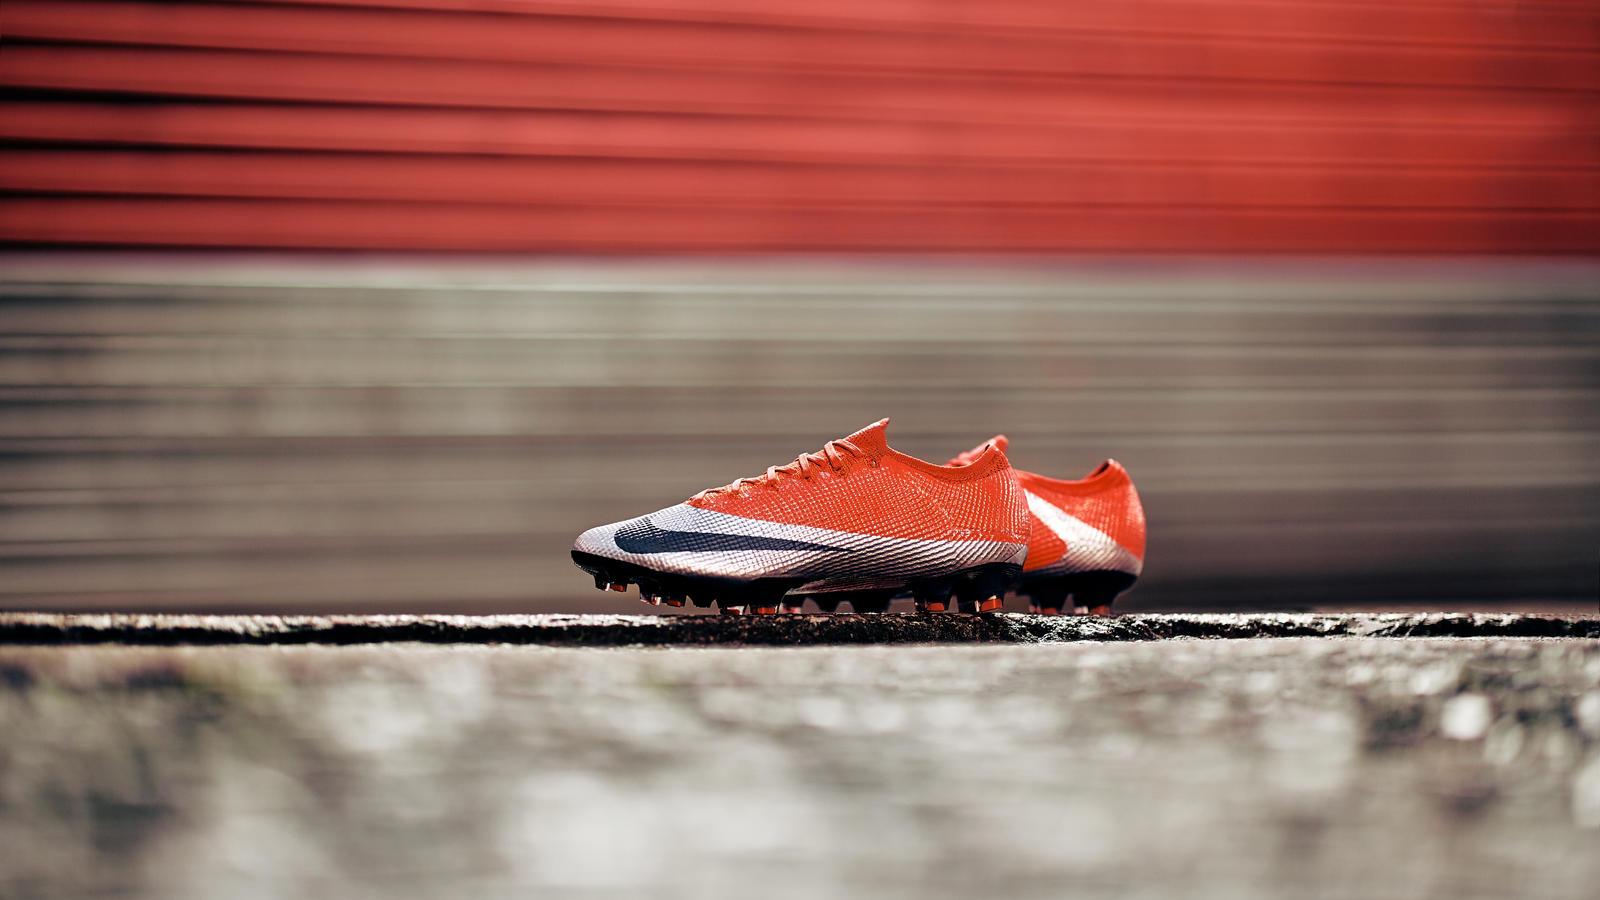 Nike Mercurial Vapor 'Future DNA Mercurial' 3